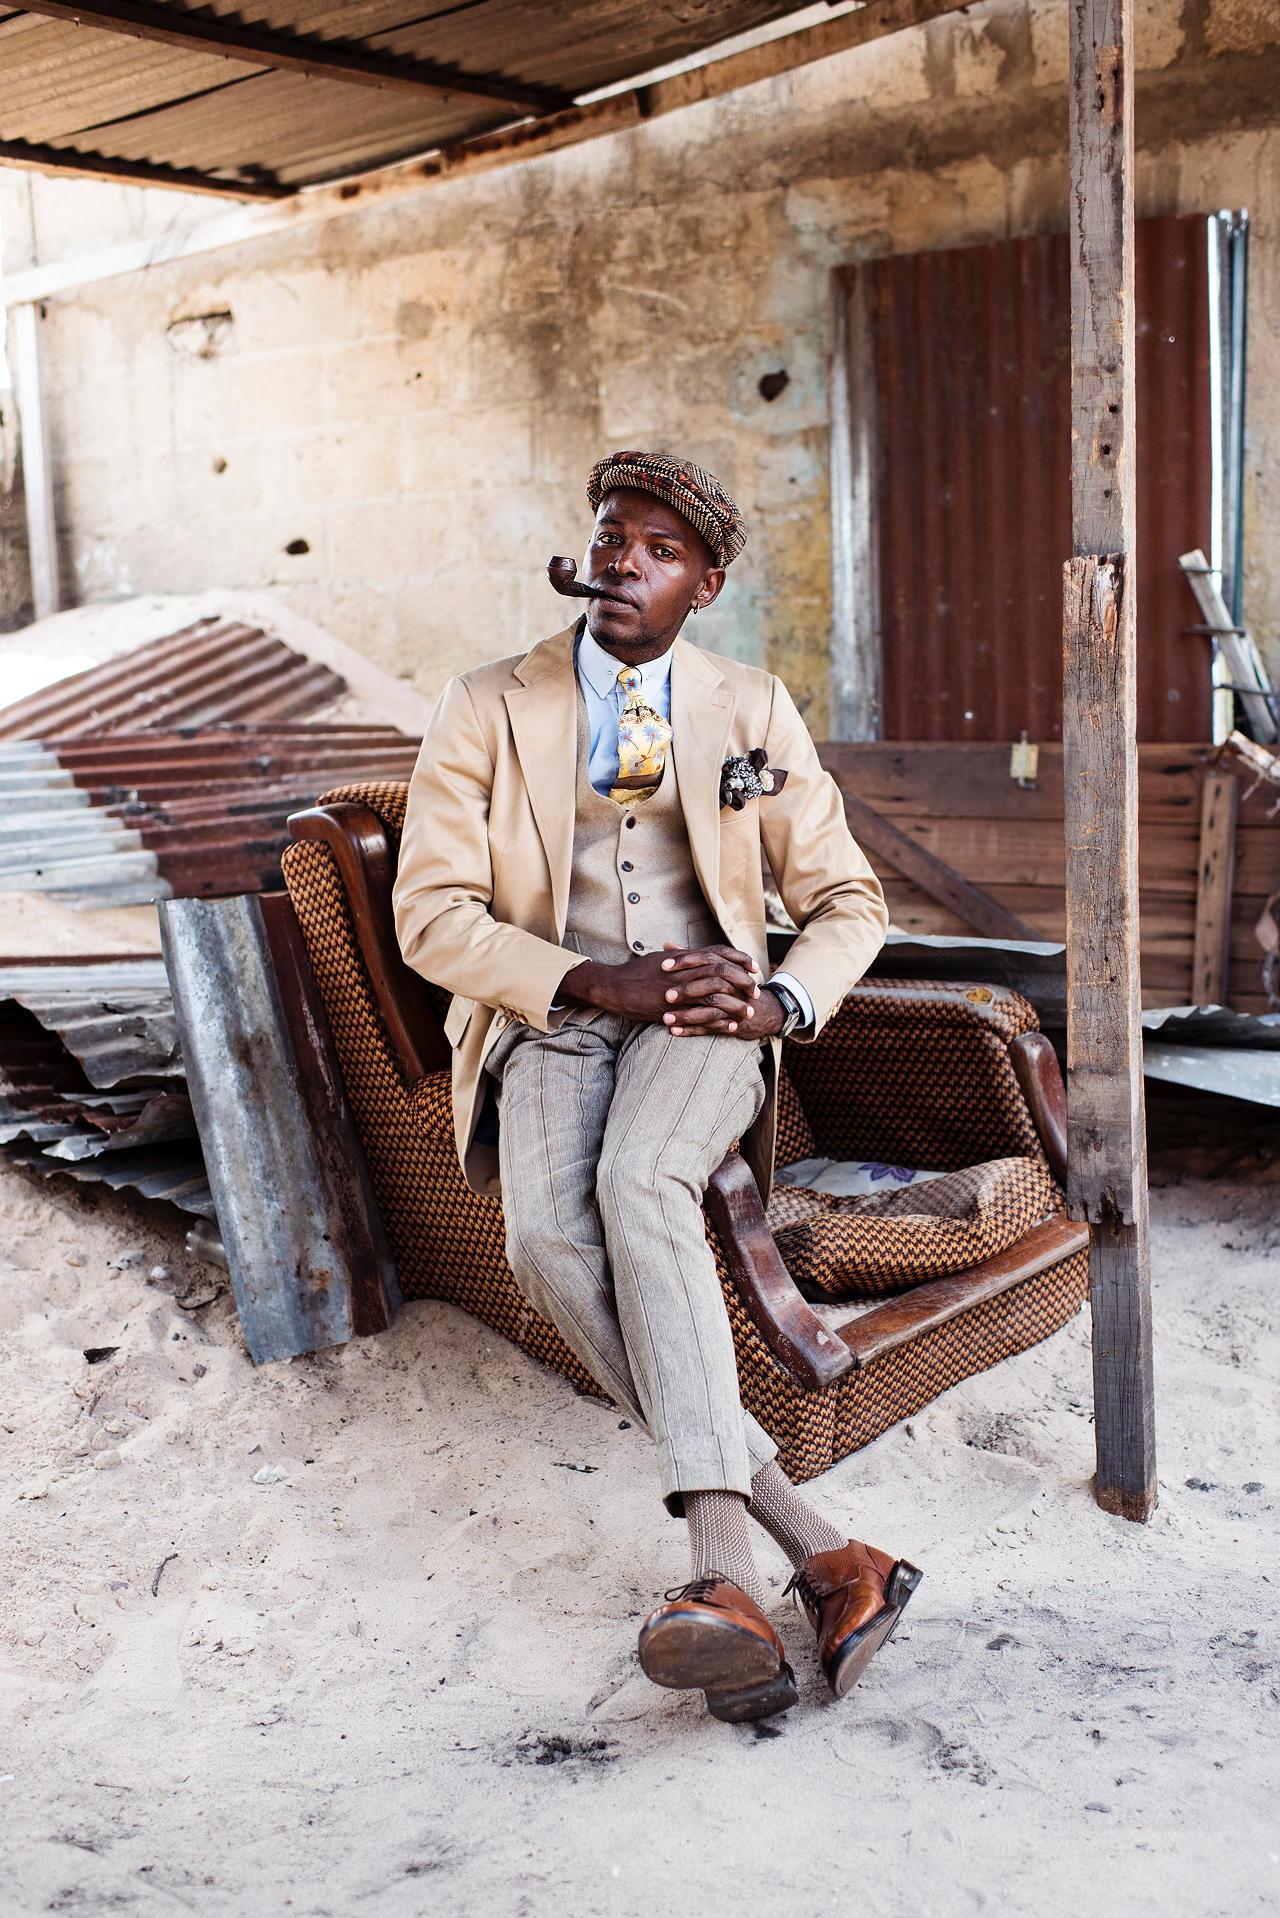 Kai Löffelbein - Pride and Prejudice – Sapeurs of Brazzaville - Felix Schoeller Photoaward